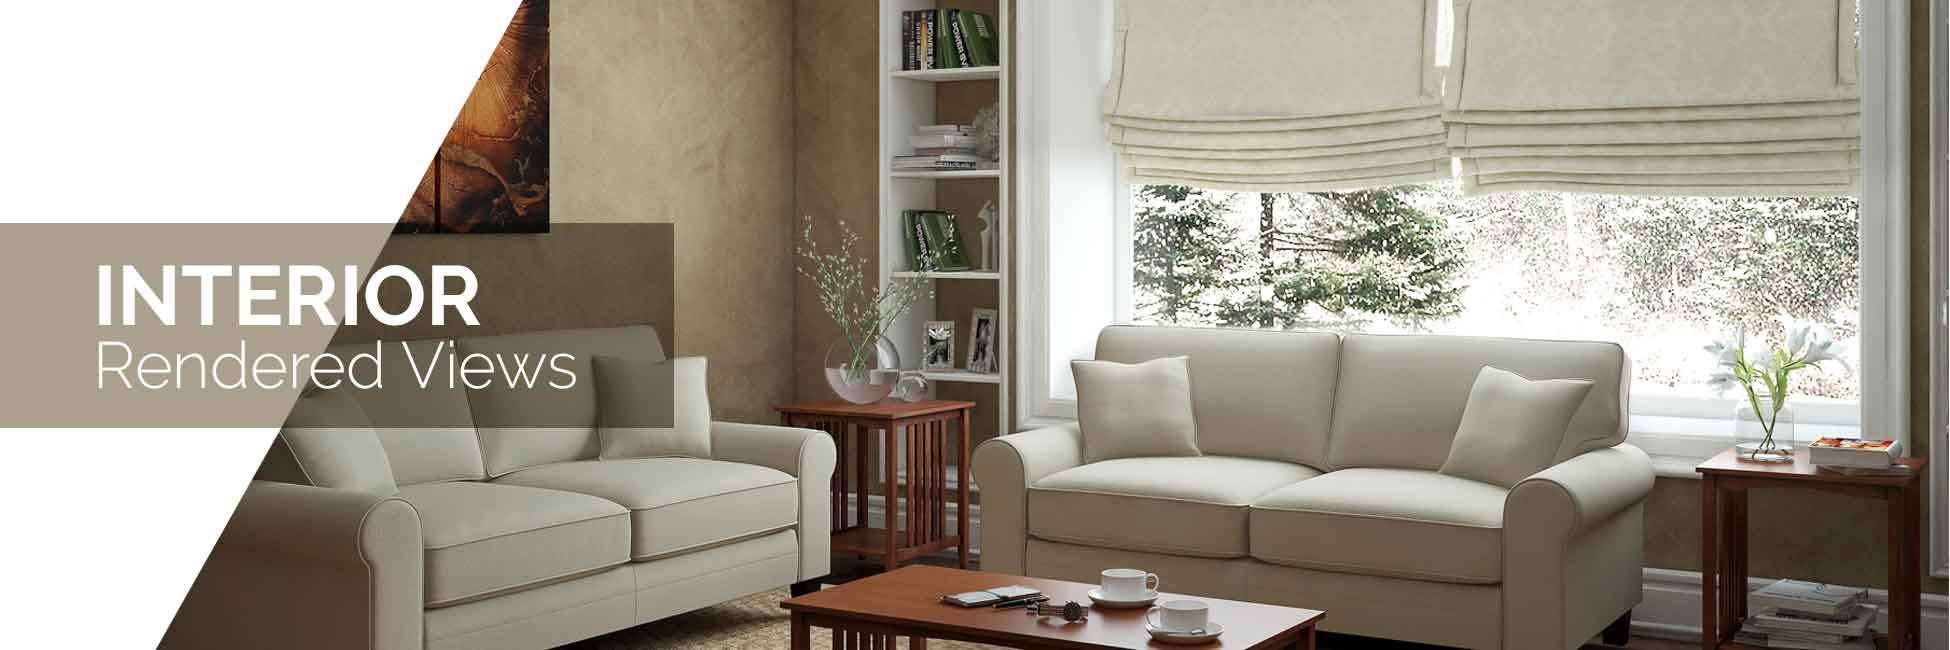 Interior Rendered views